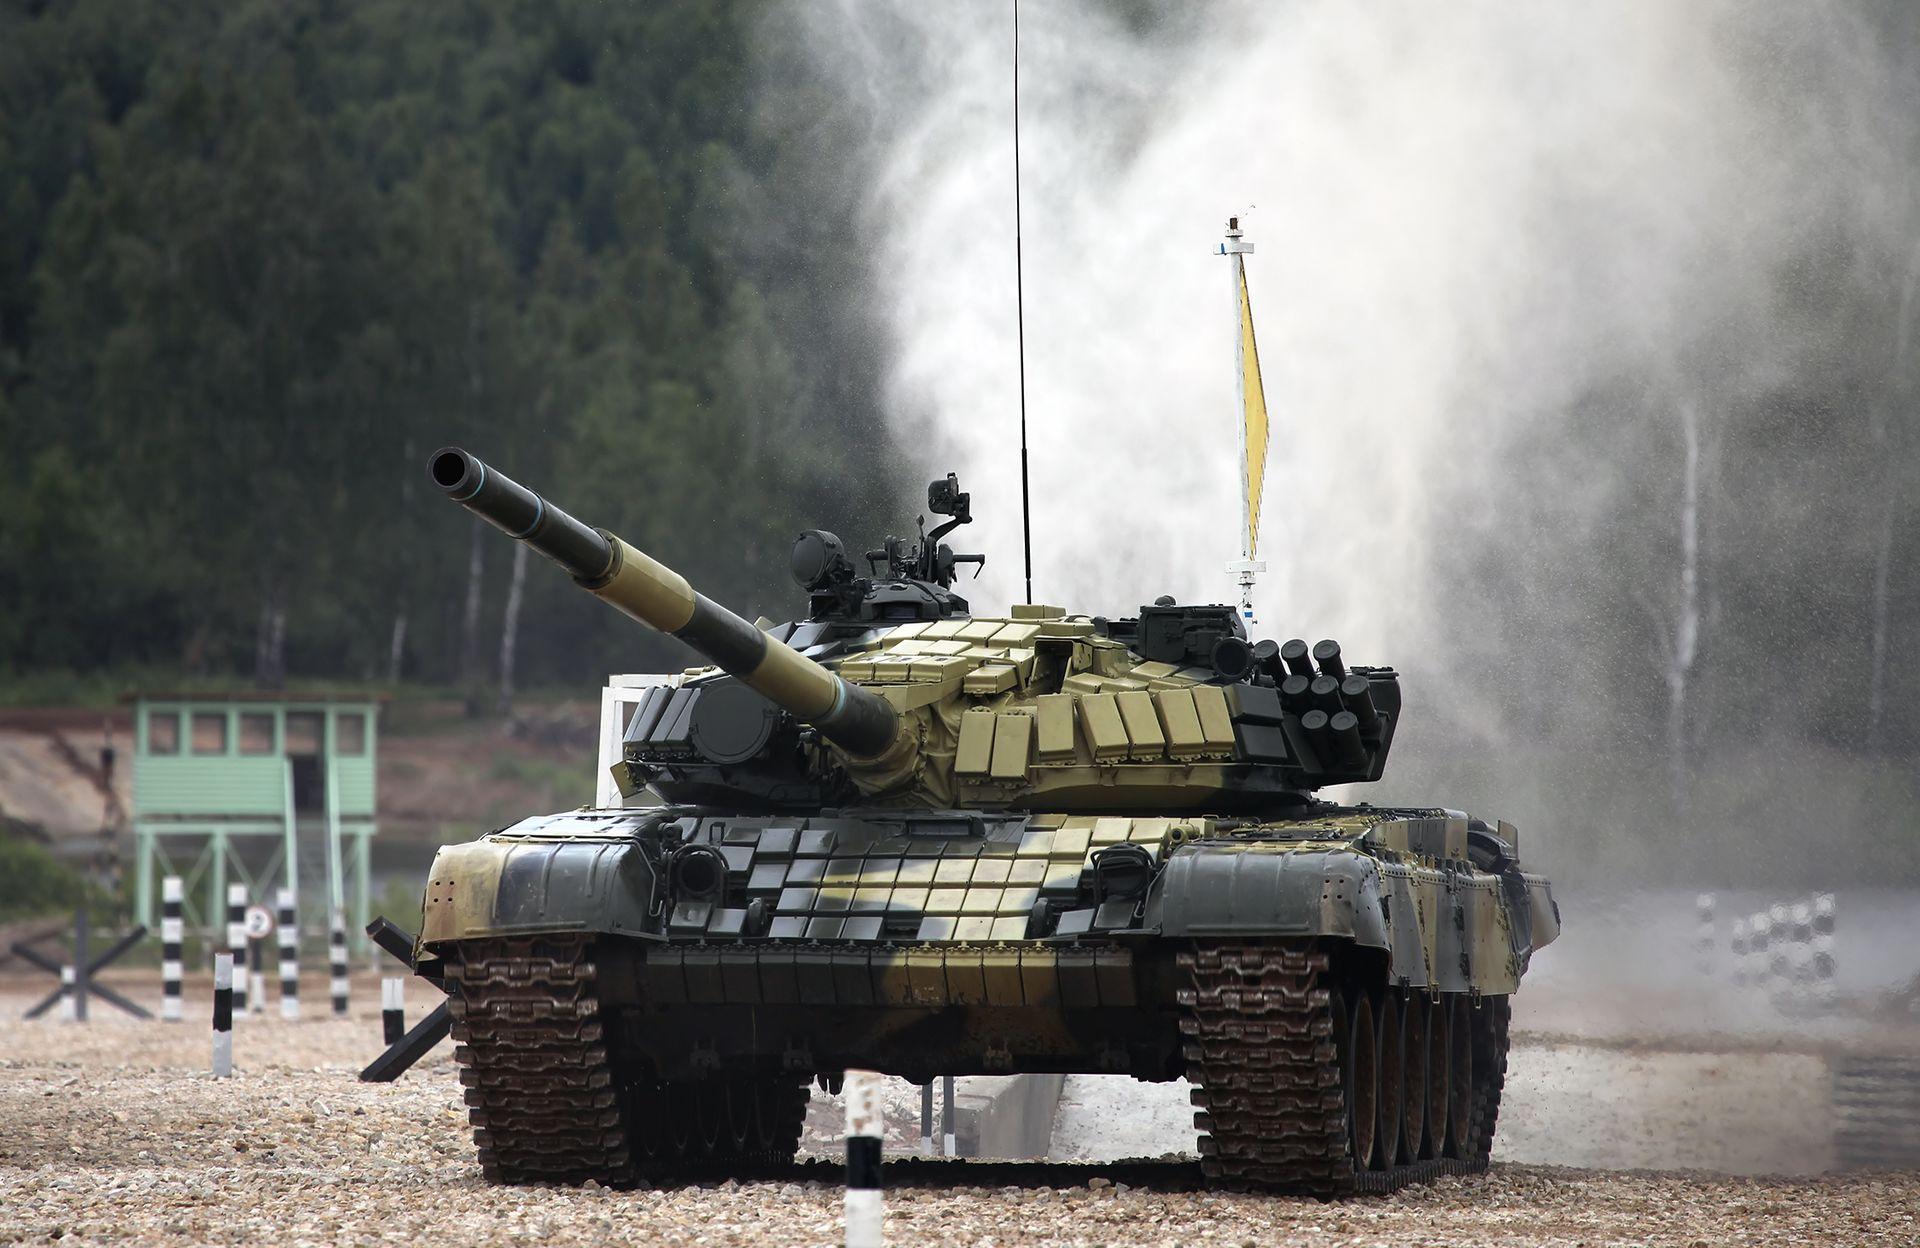 1920px-T-72B_-_TankBiathlon14part1-01.jp